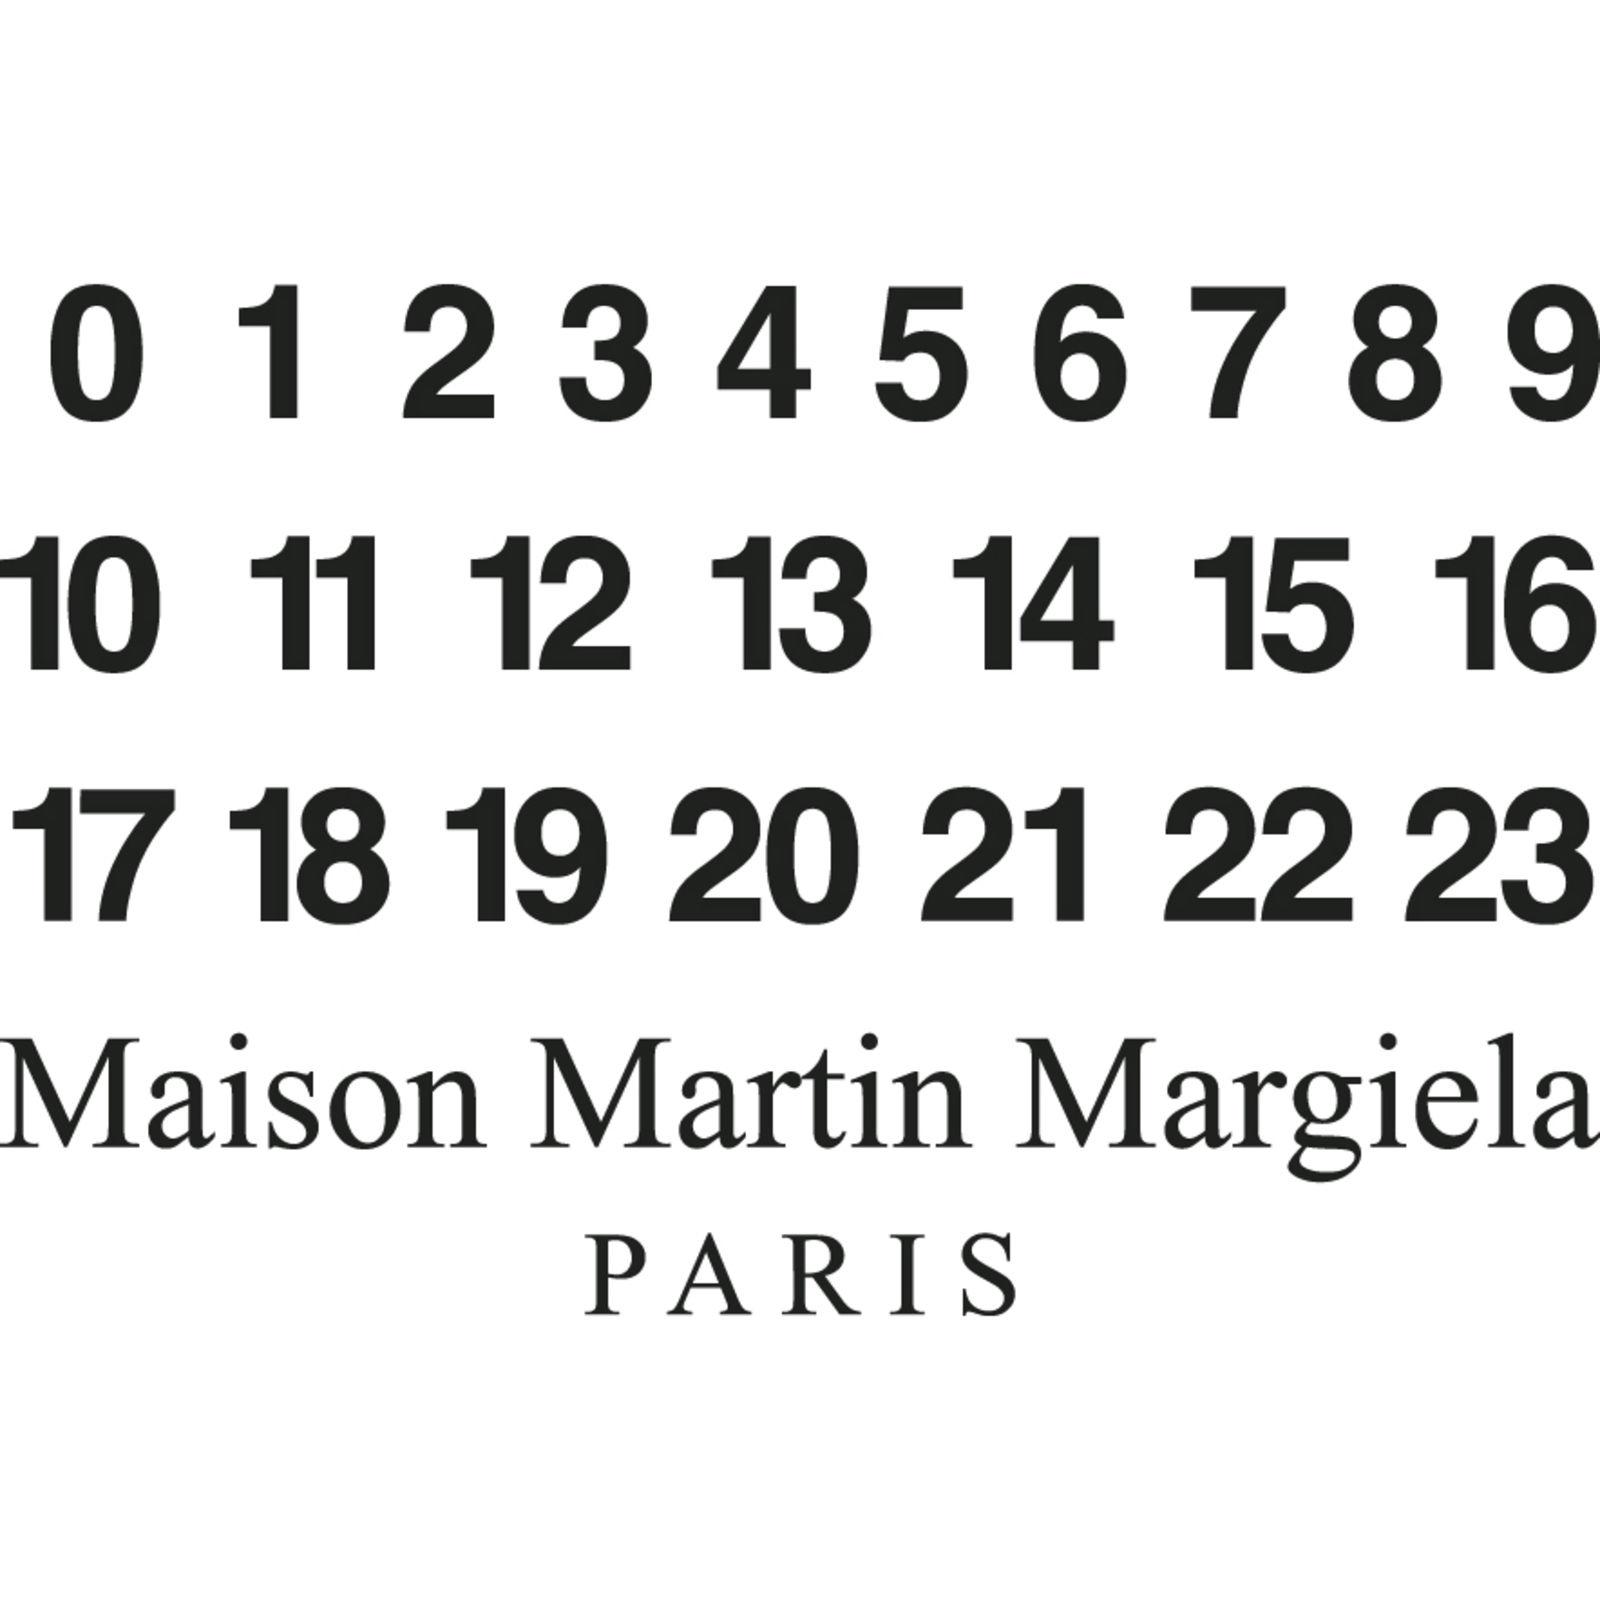 Maison Margiela Artisanal (Bild 1)